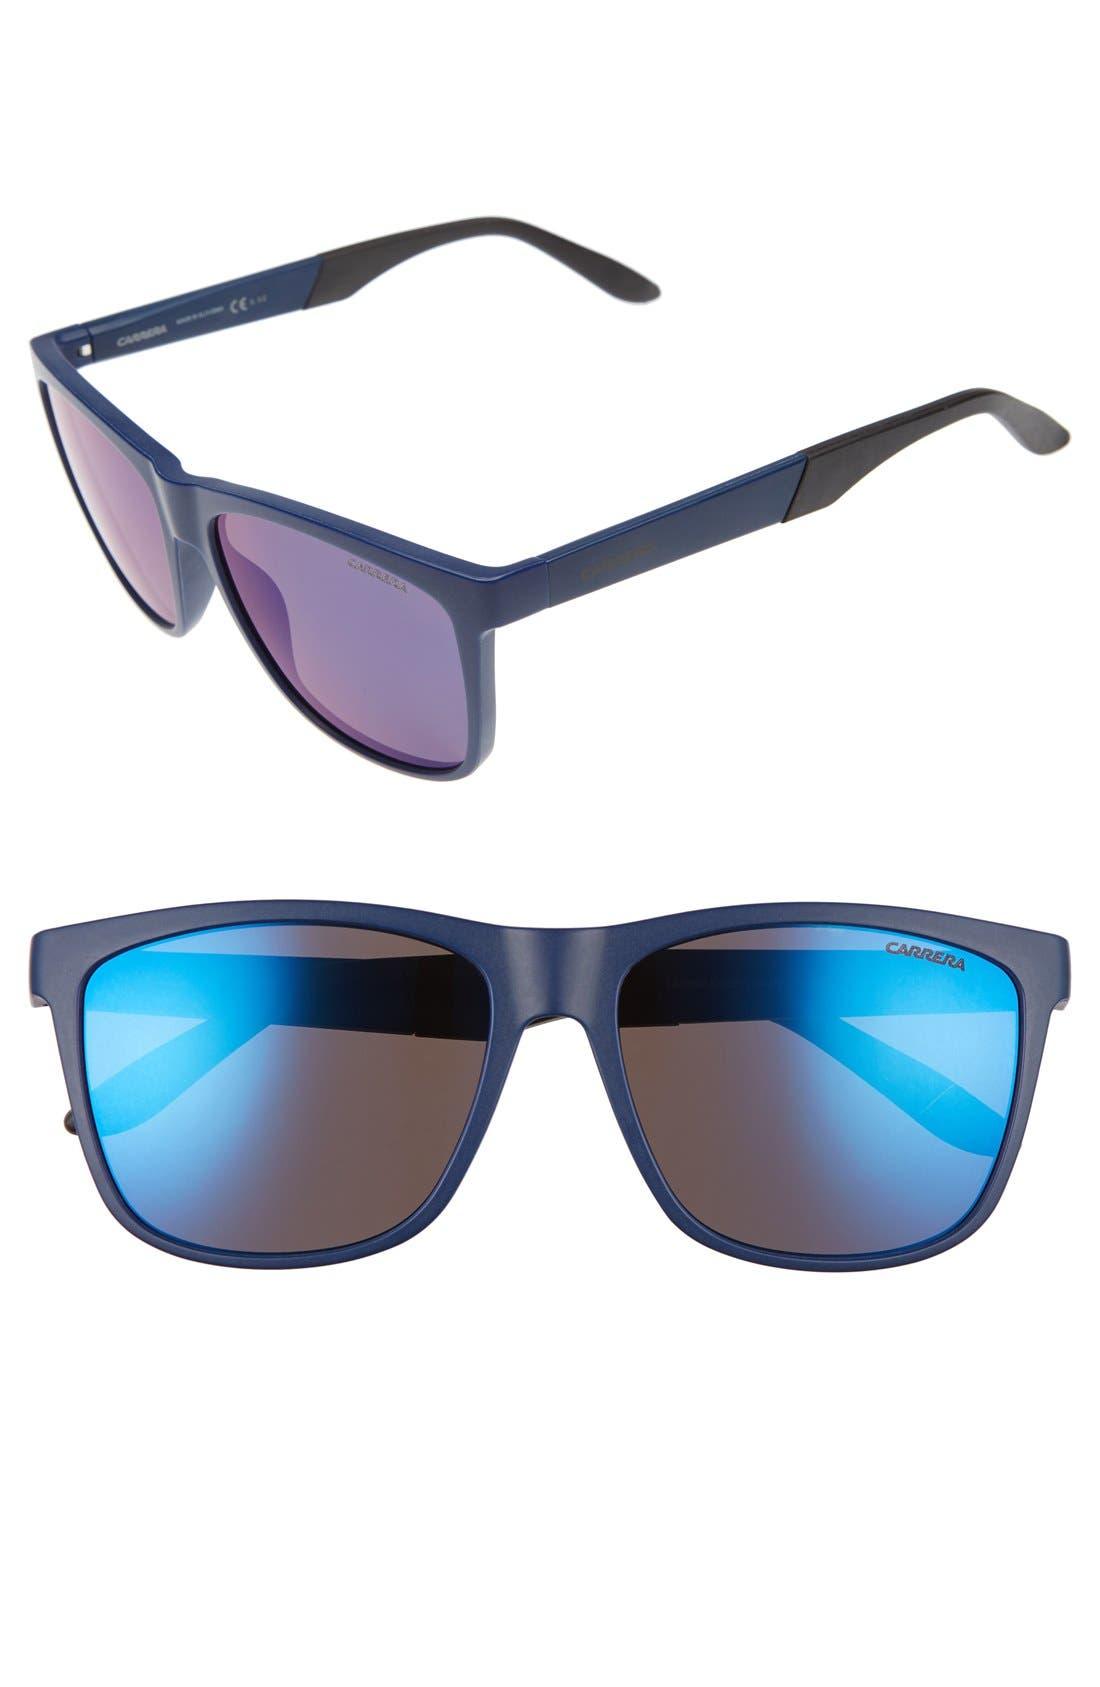 Carrera Eyewear 8022/S 56mm Polarized Sunglasses